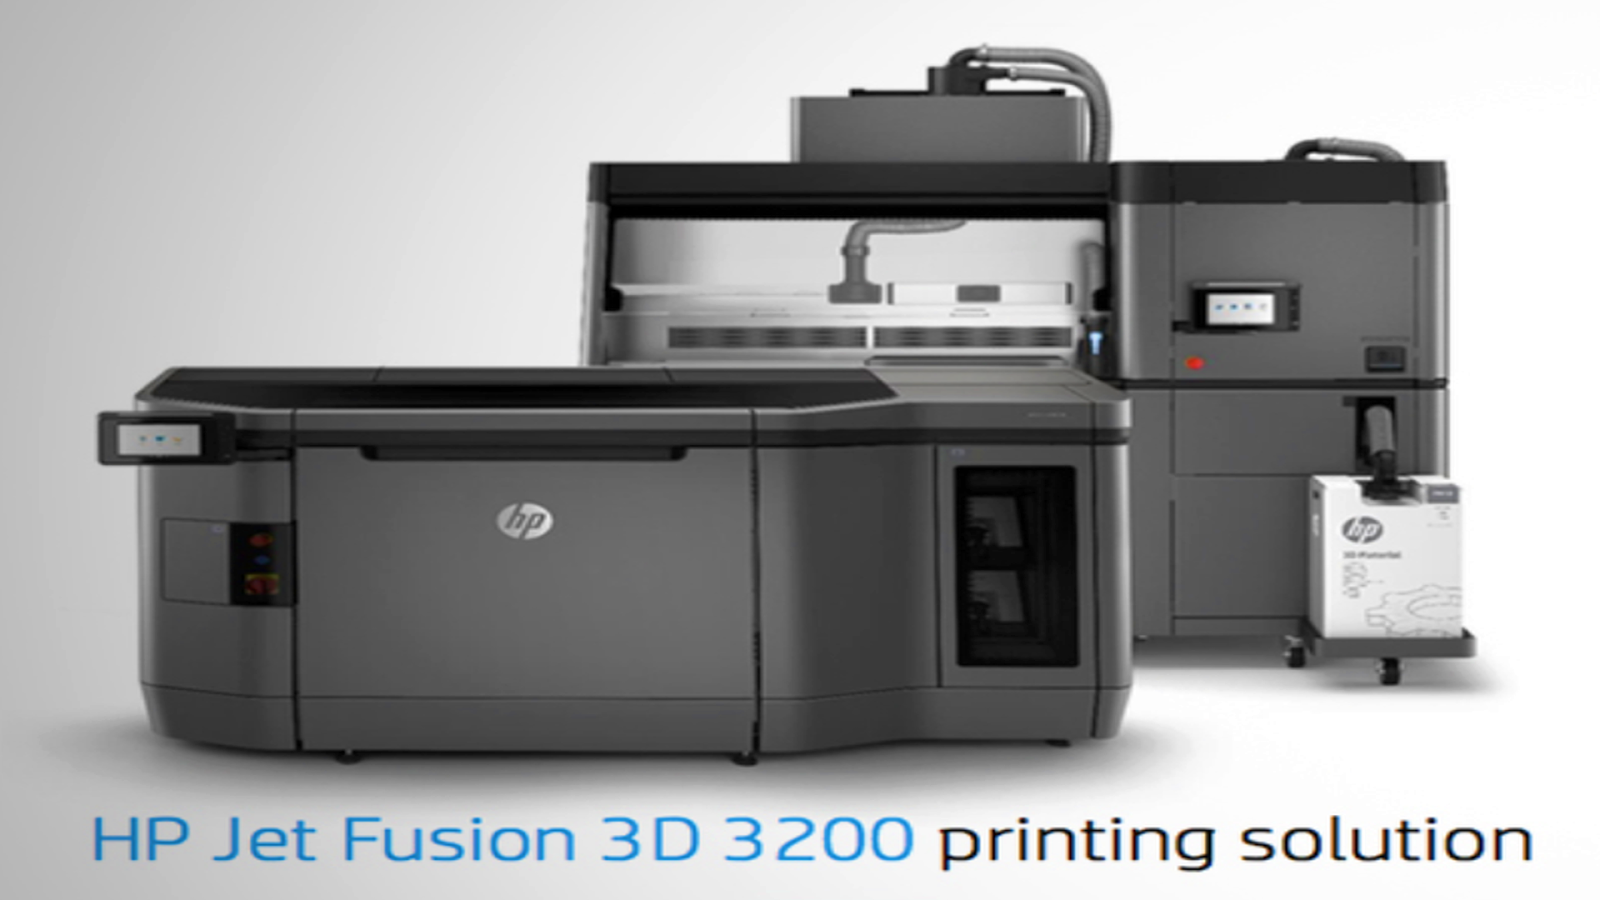 hp jet fusion 3d 4200 manual pdf 3d printer manual. Black Bedroom Furniture Sets. Home Design Ideas